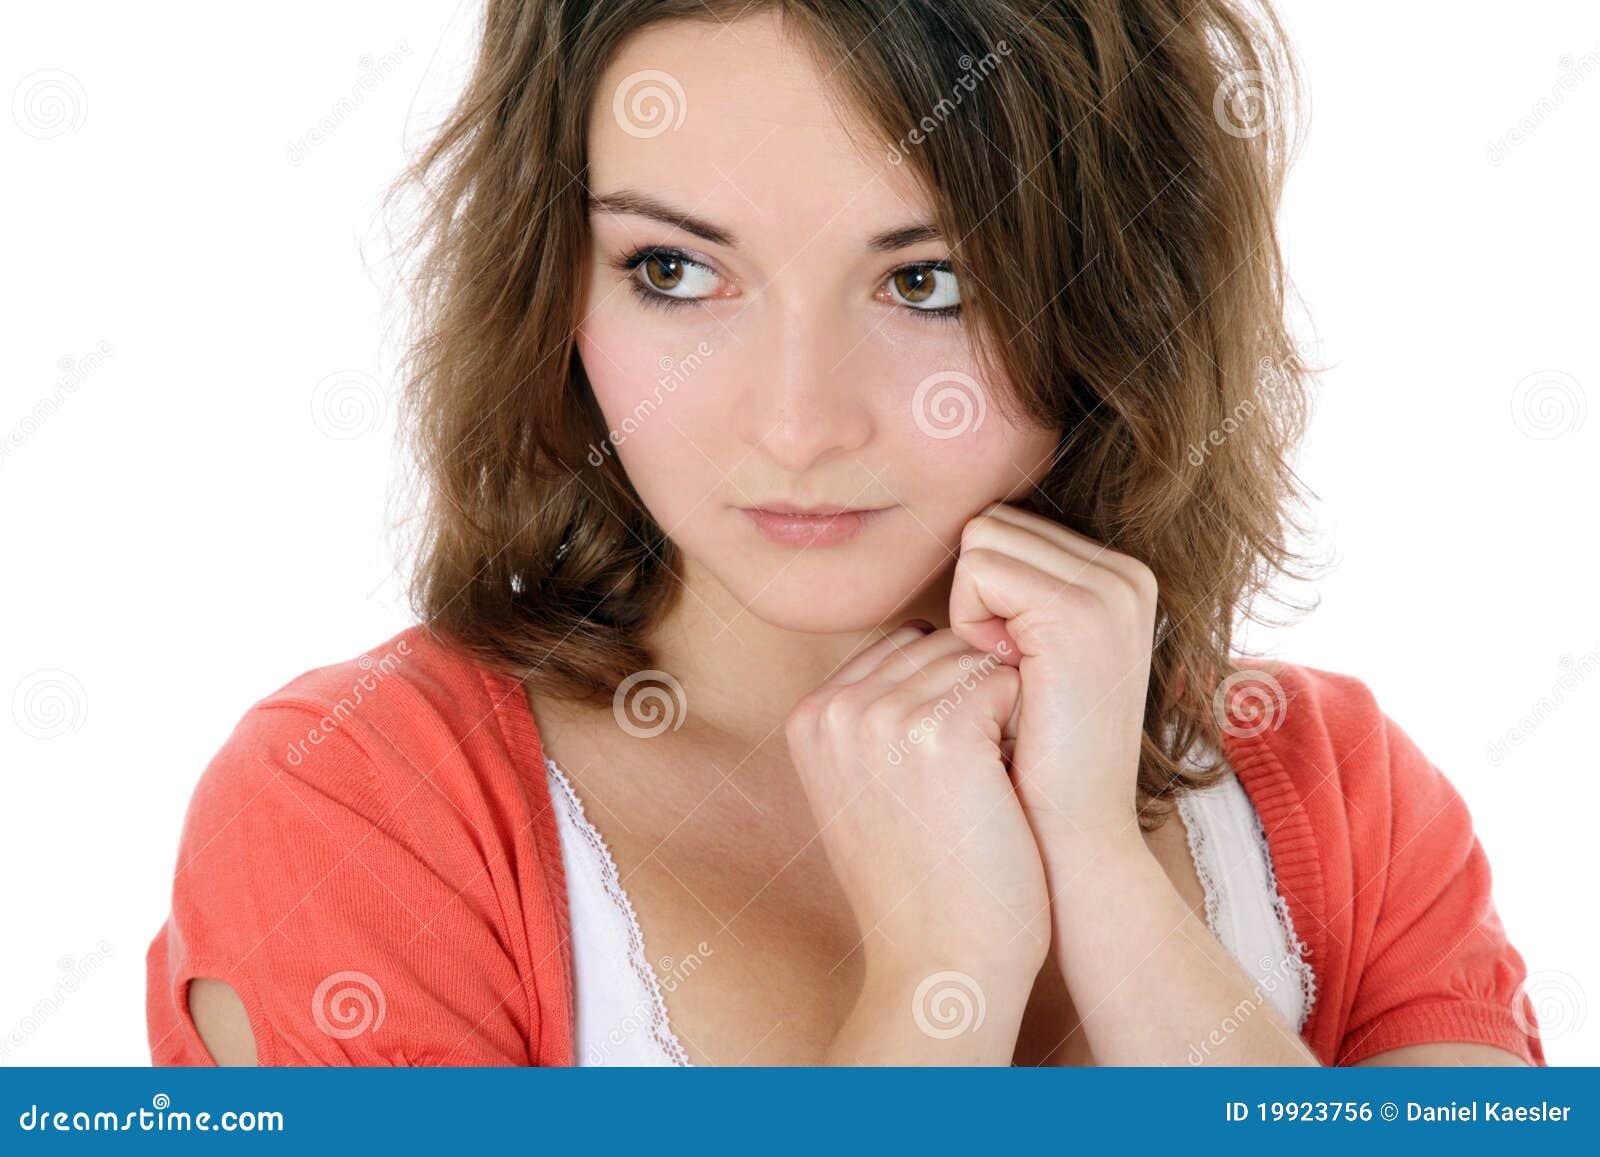 briana-shy-teenager-girl